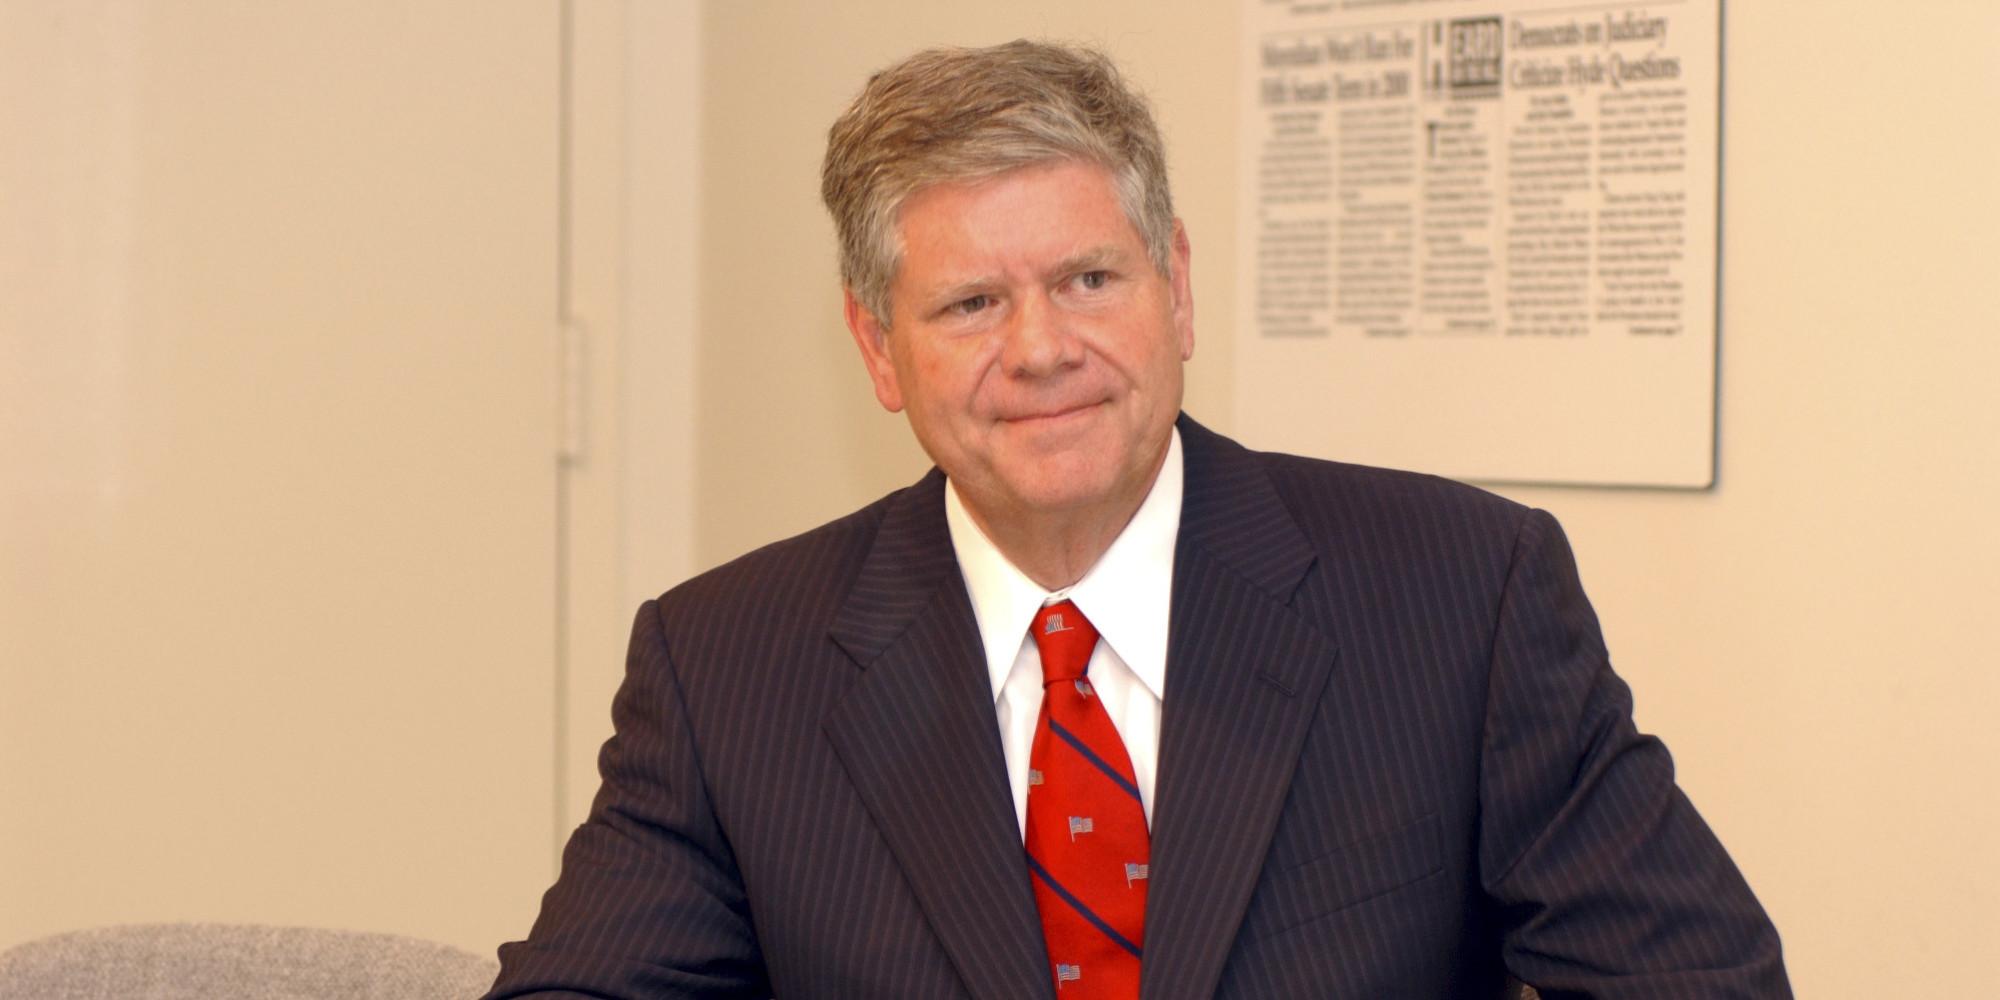 Jim Oberweis